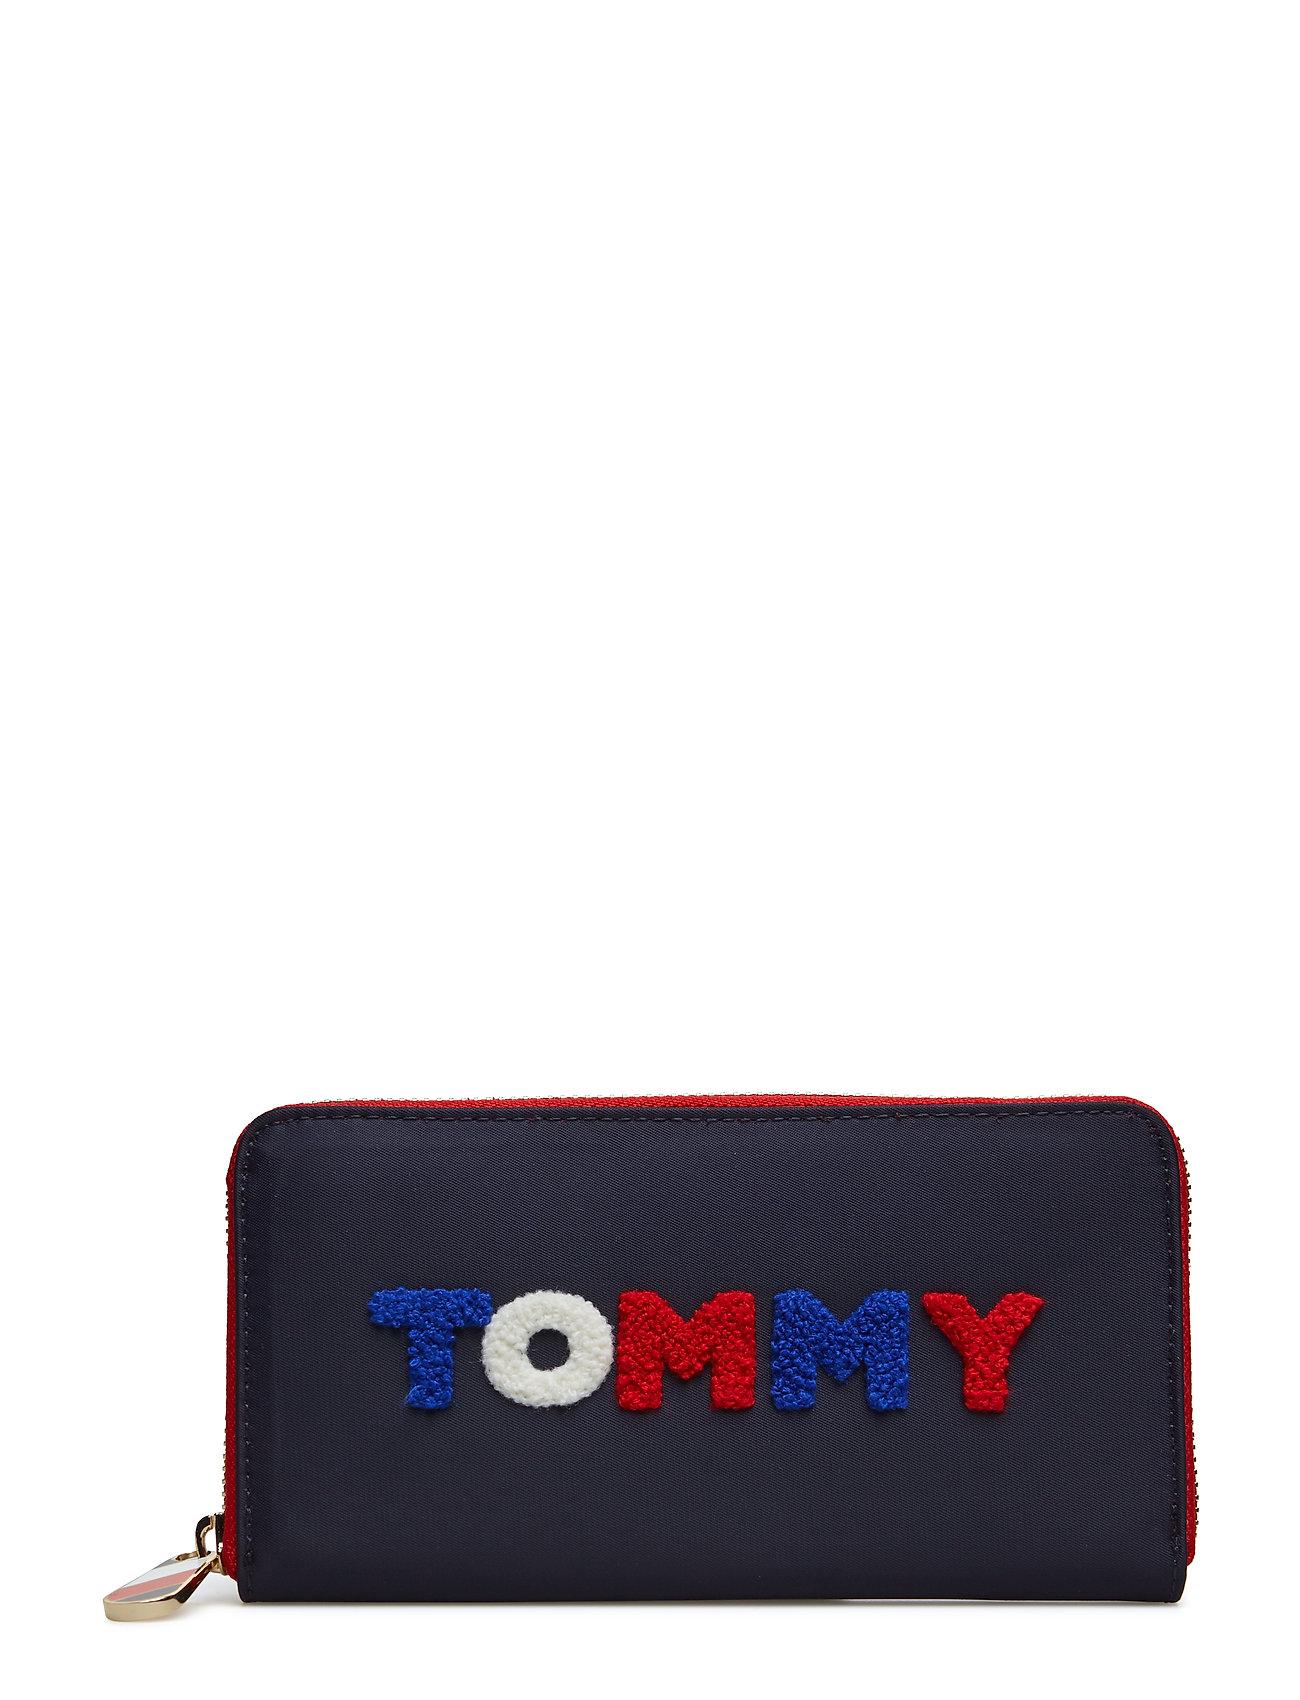 Poppy Lrg Za Wallet Tommy Navy Tommy Print 3295 Tommy